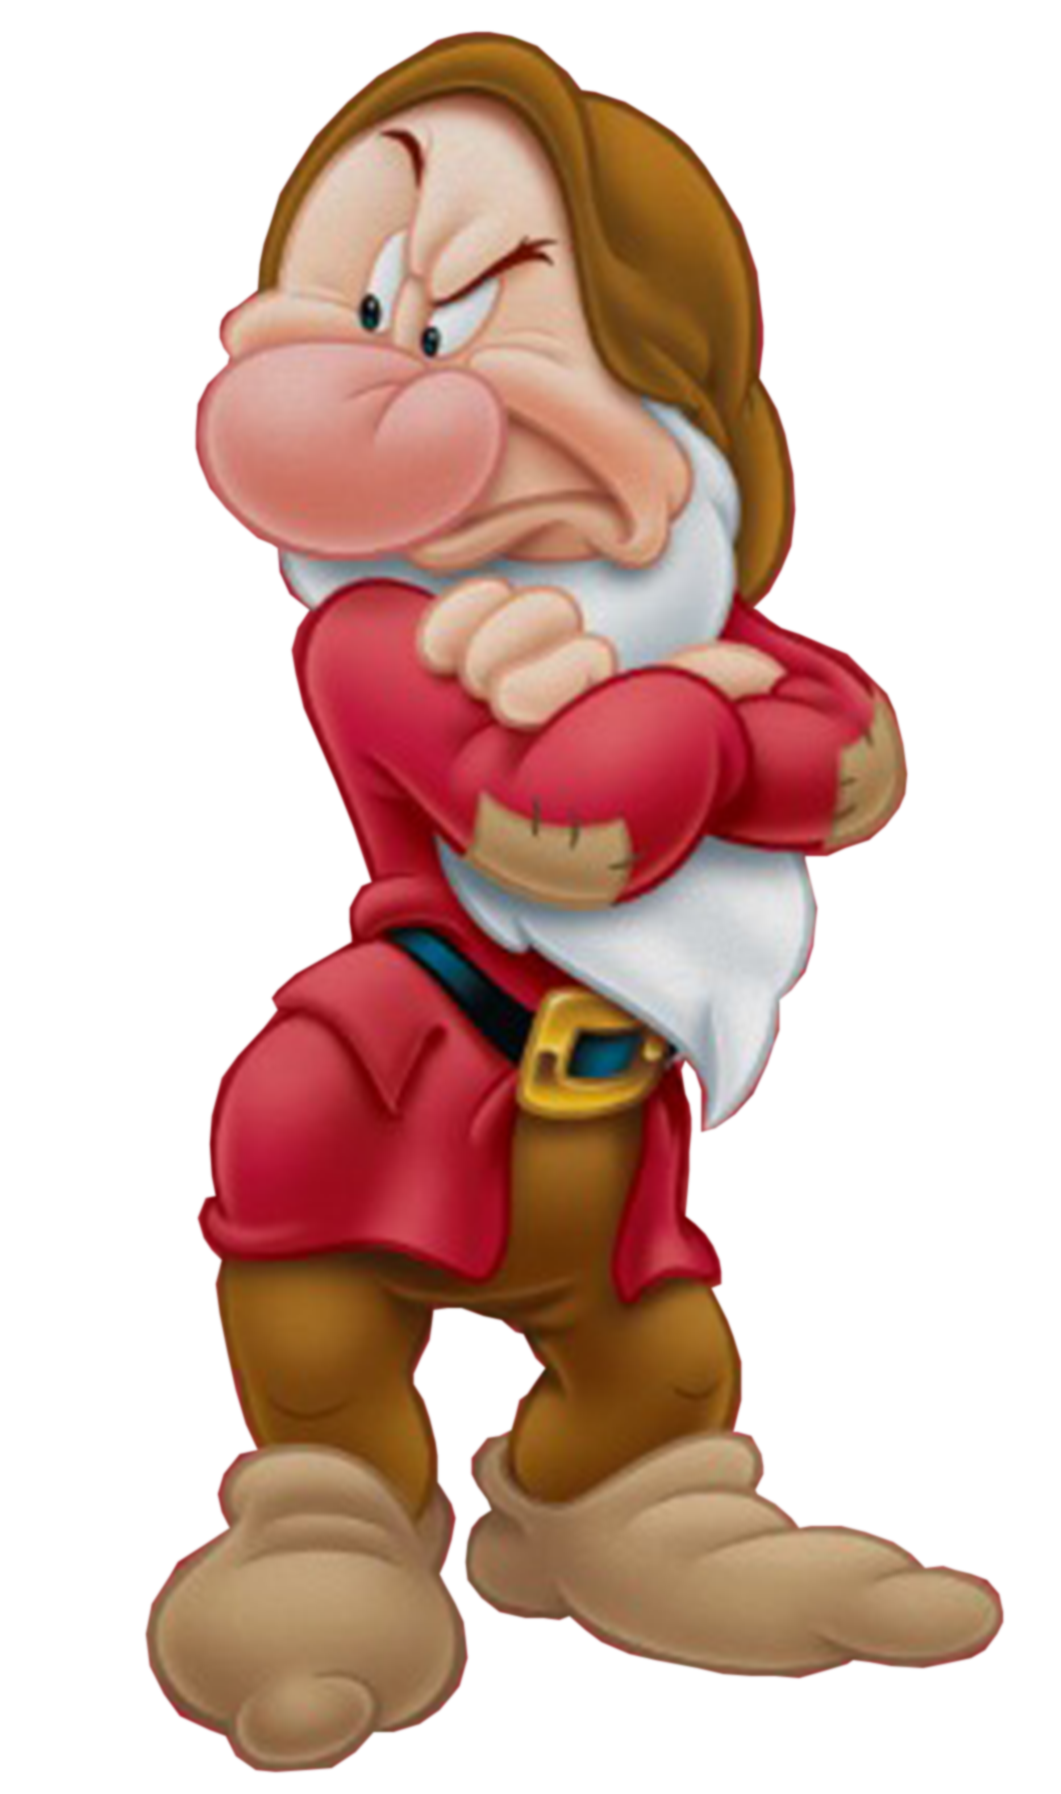 Grumpy from 7 dwarfs with arms crossed clipart vector royalty free library Grumpy | Konnor\'s Board | Disney, Disney cartoon characters, Grumpy ... vector royalty free library